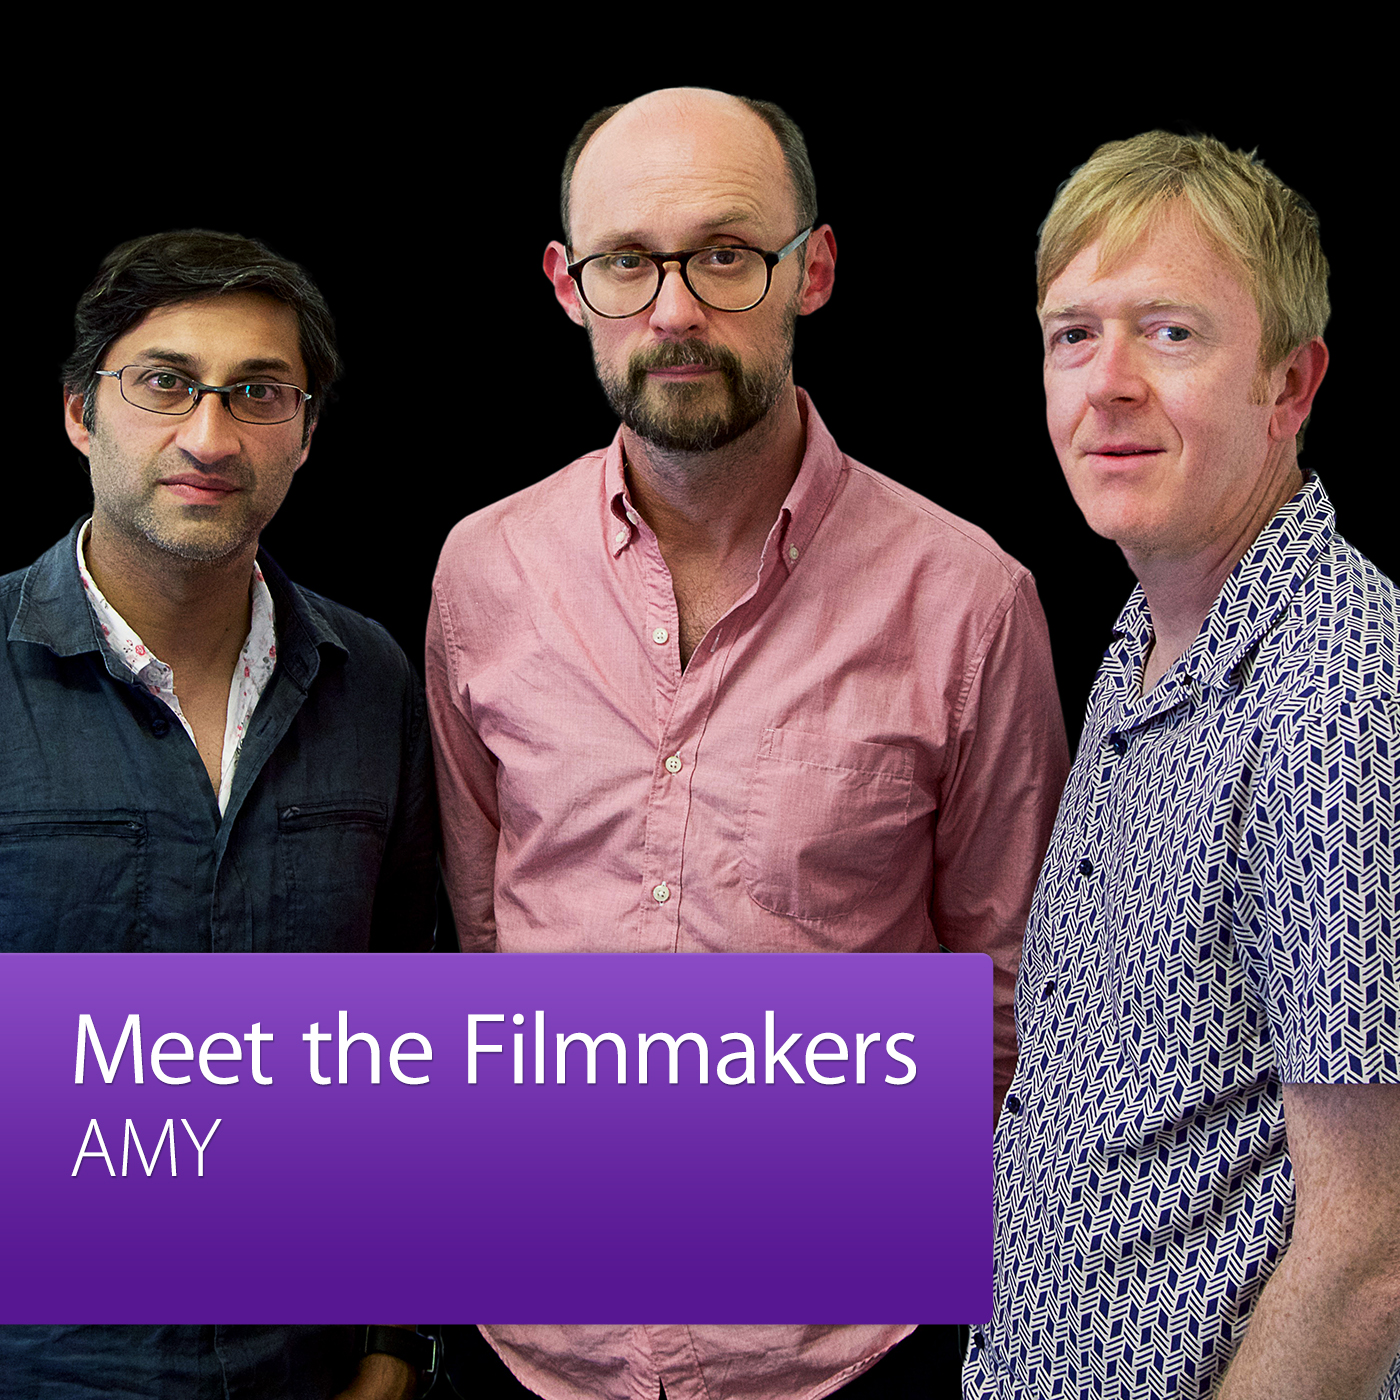 AMY: Meet the Filmmakers